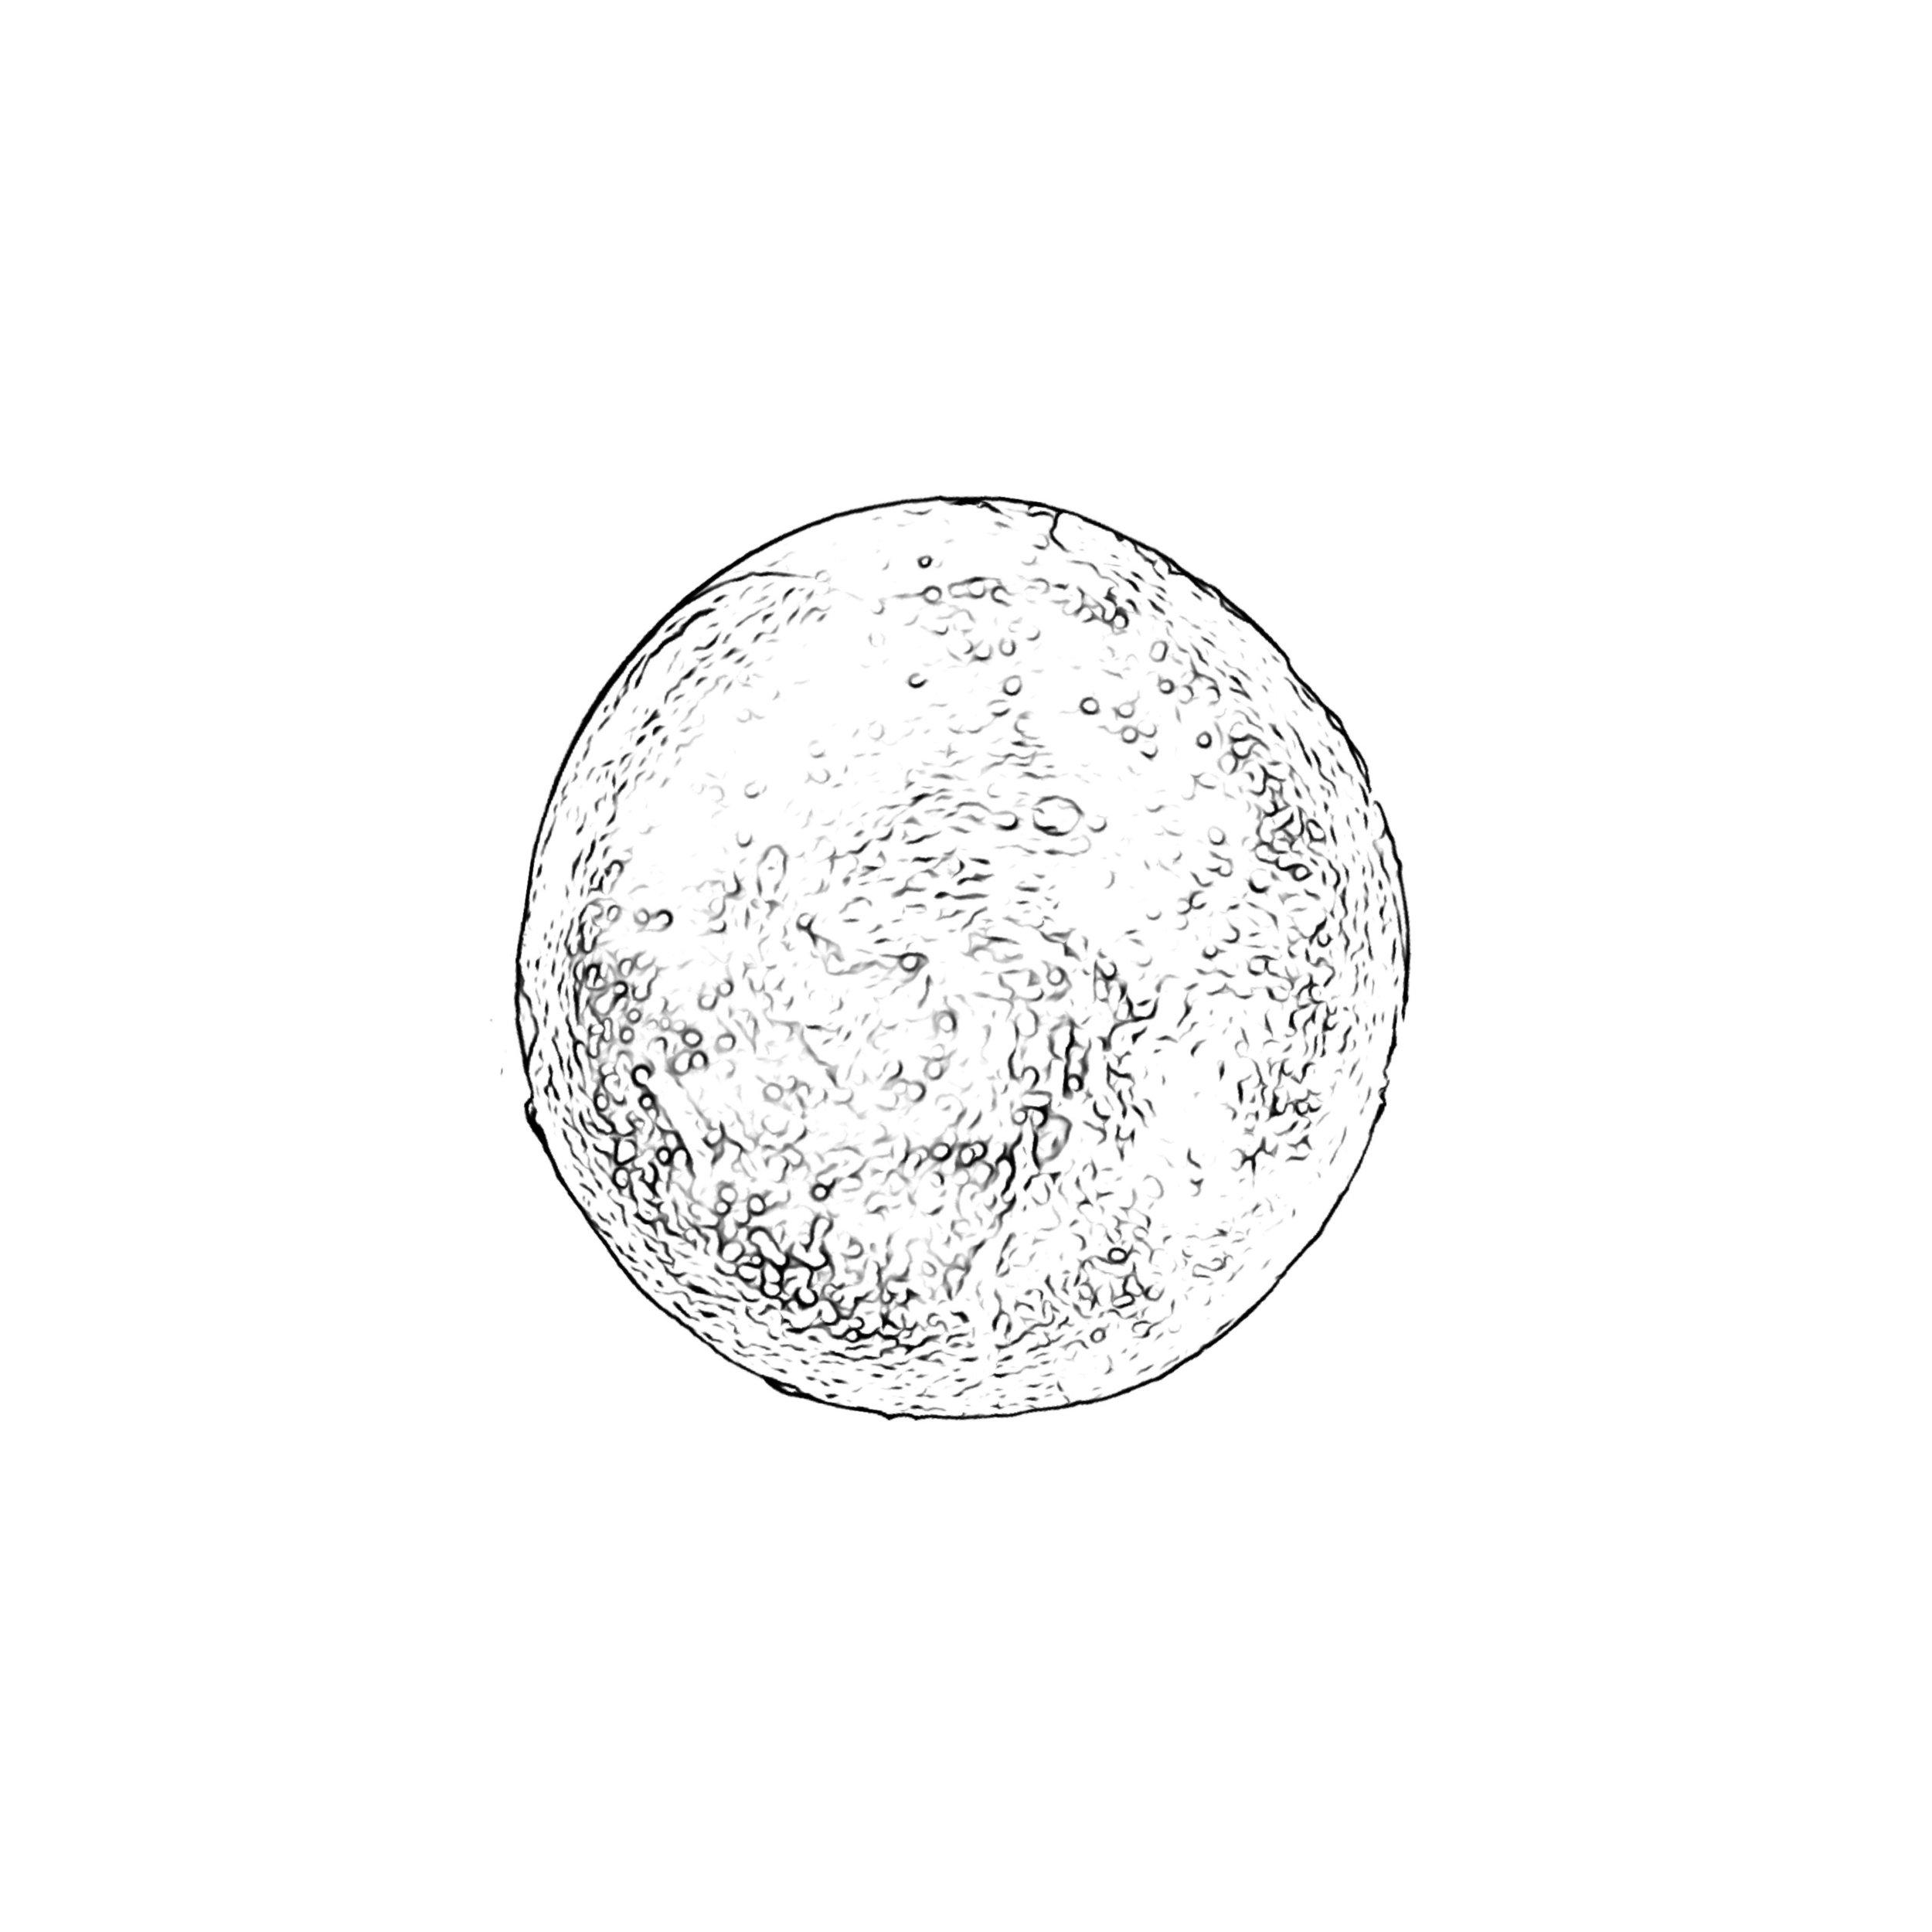 Rella Sketch 3.JPG